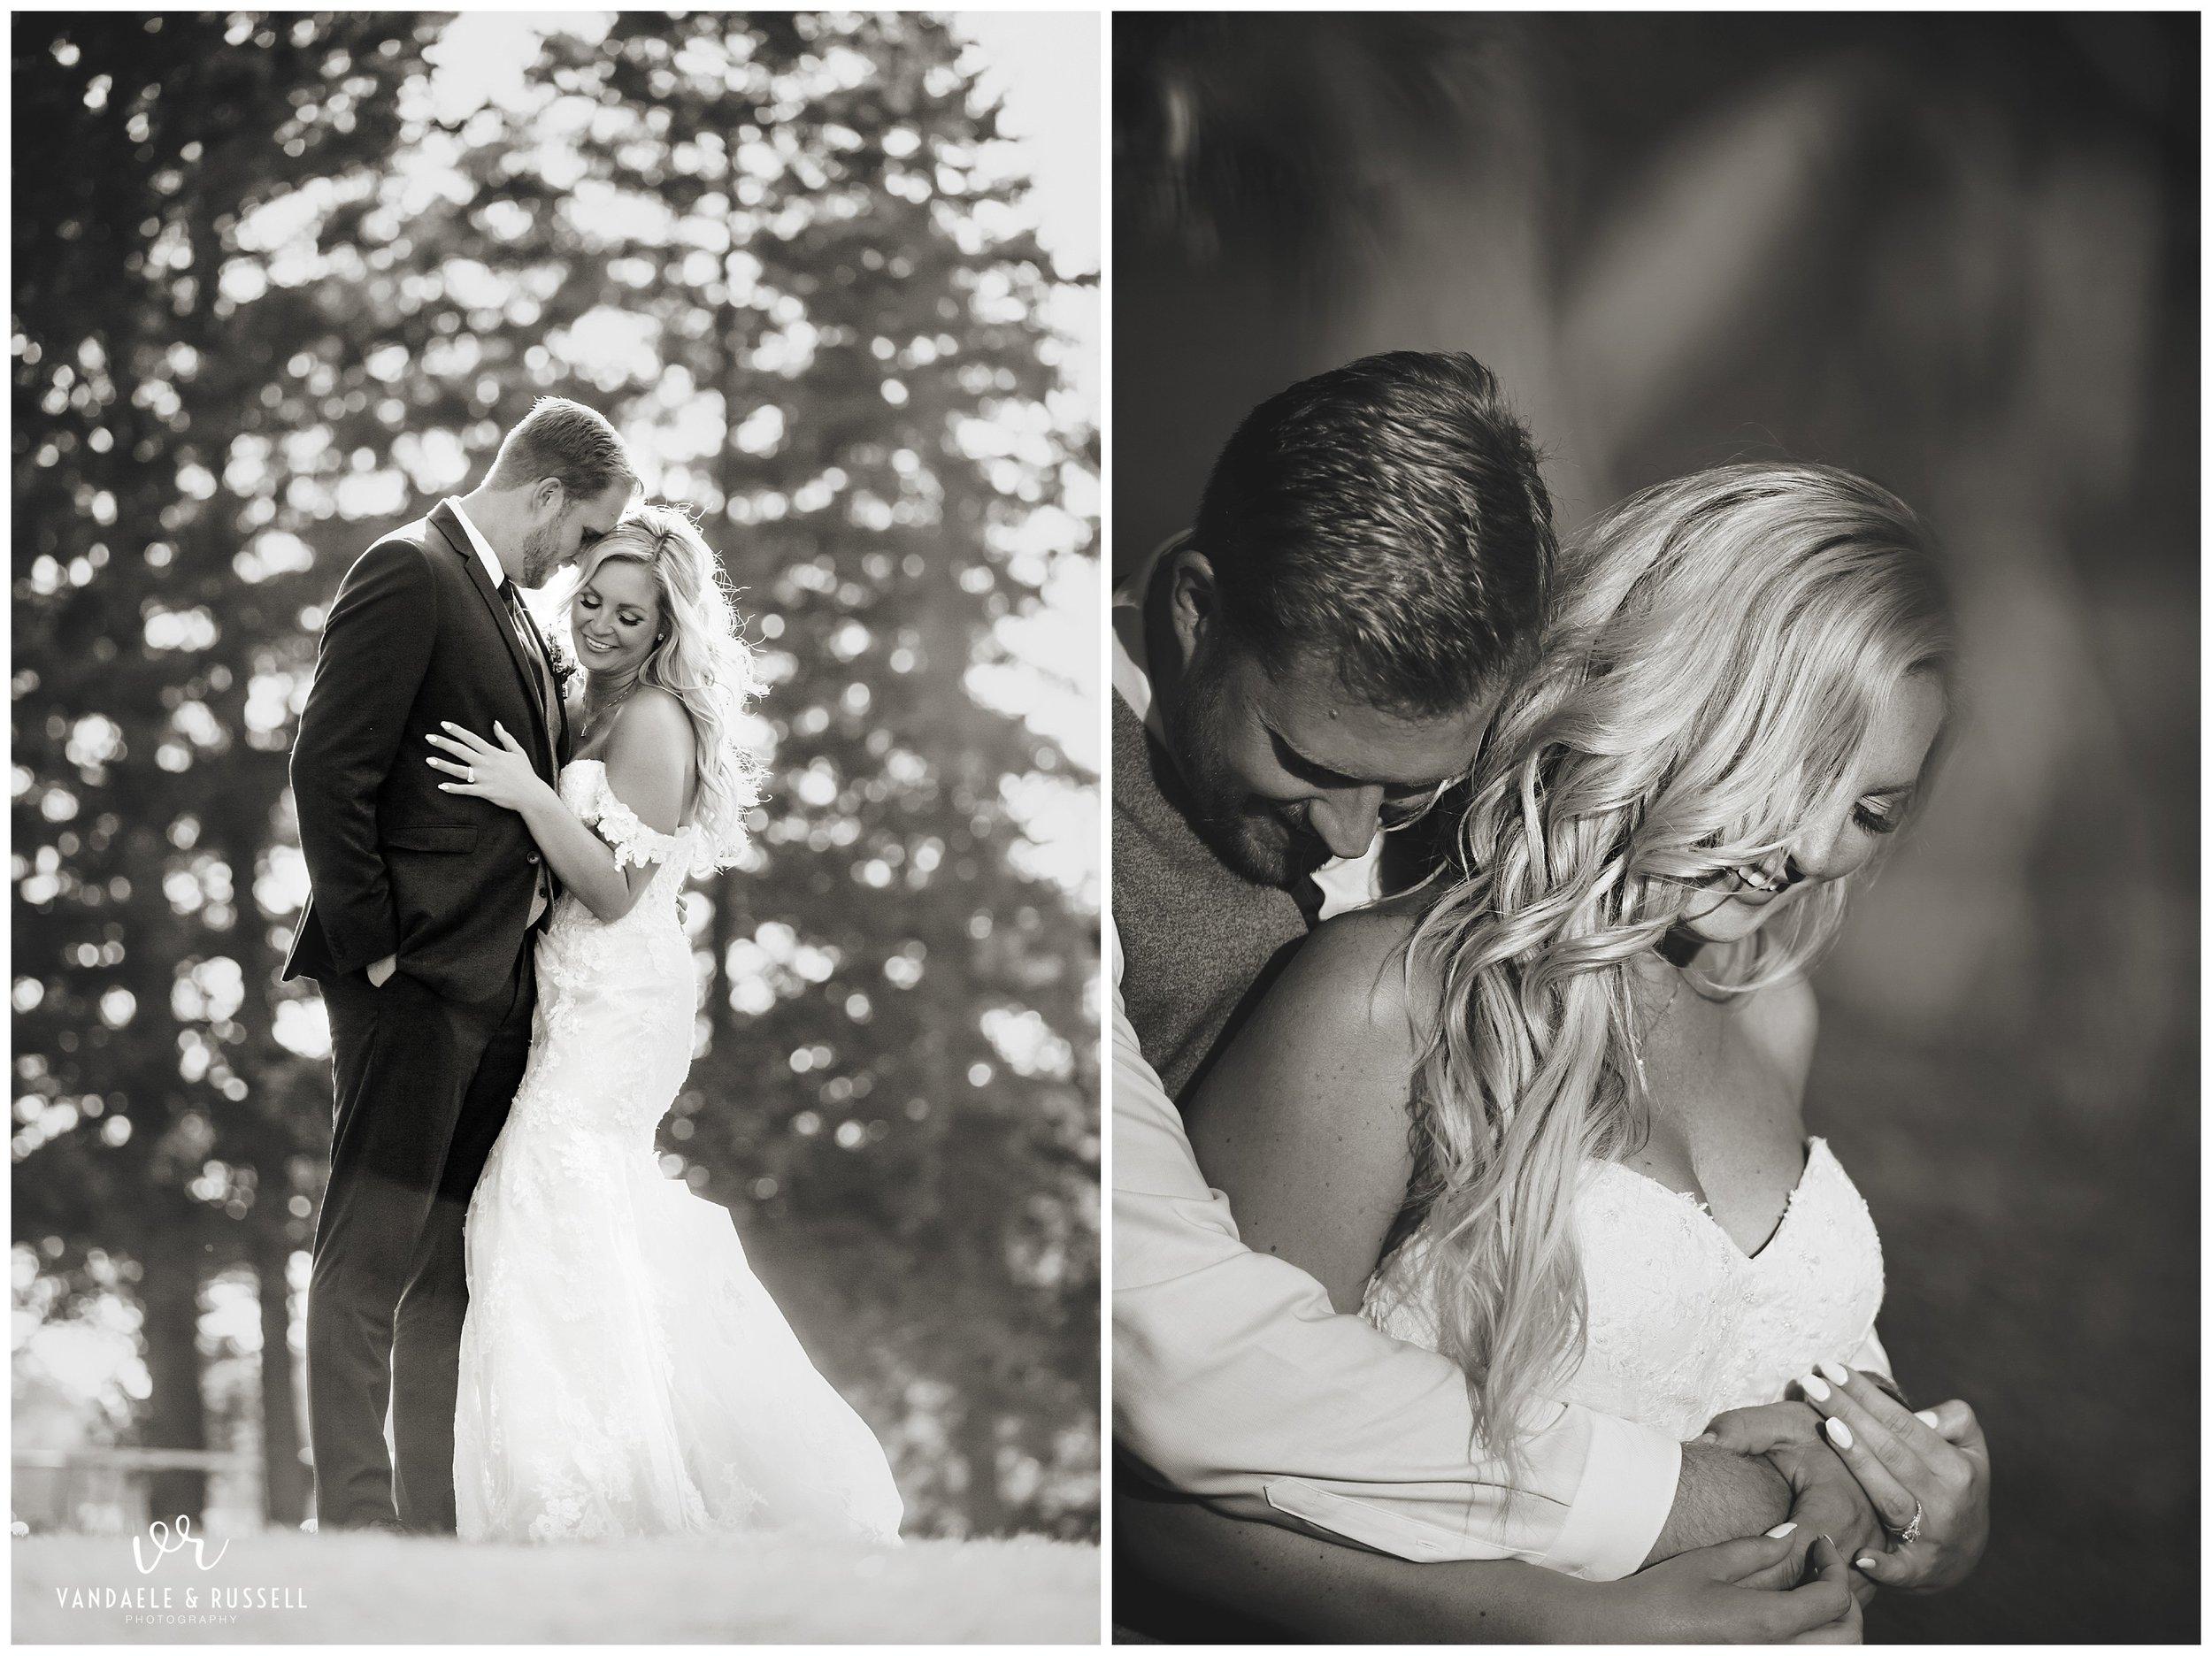 VanDaele-Russell-Wedding-Photography-London-Toronto-Ontario_0175.jpg